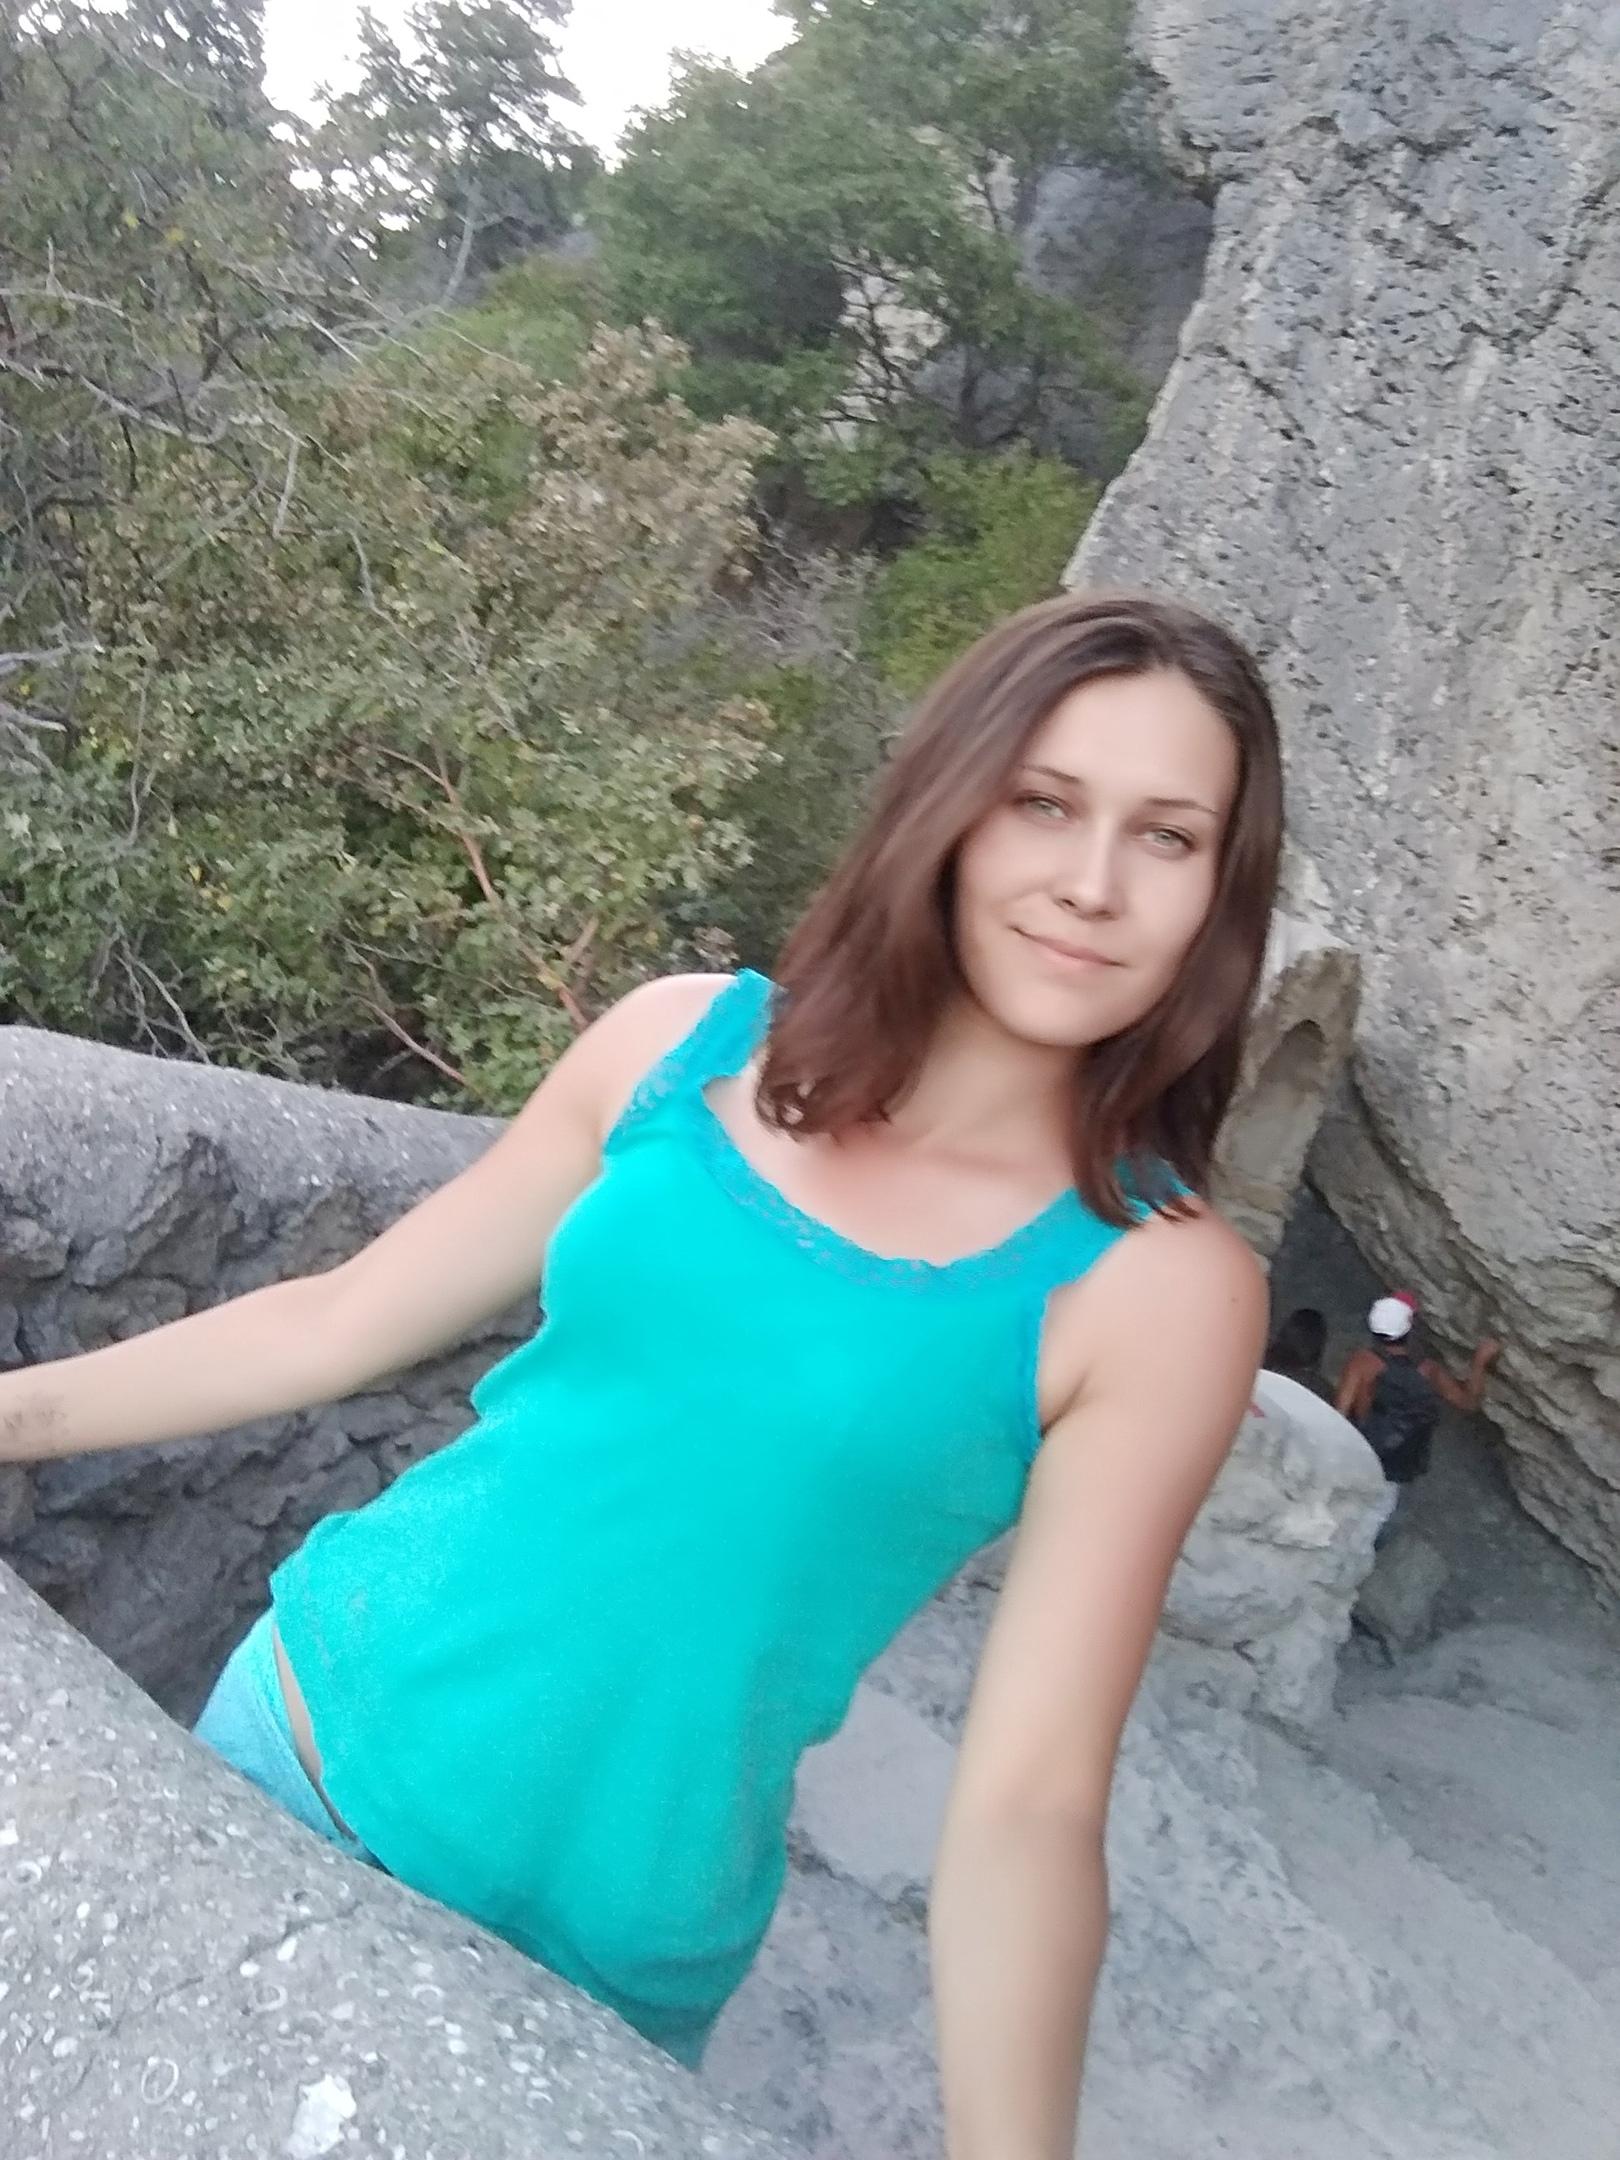 АнастасияПрохорова